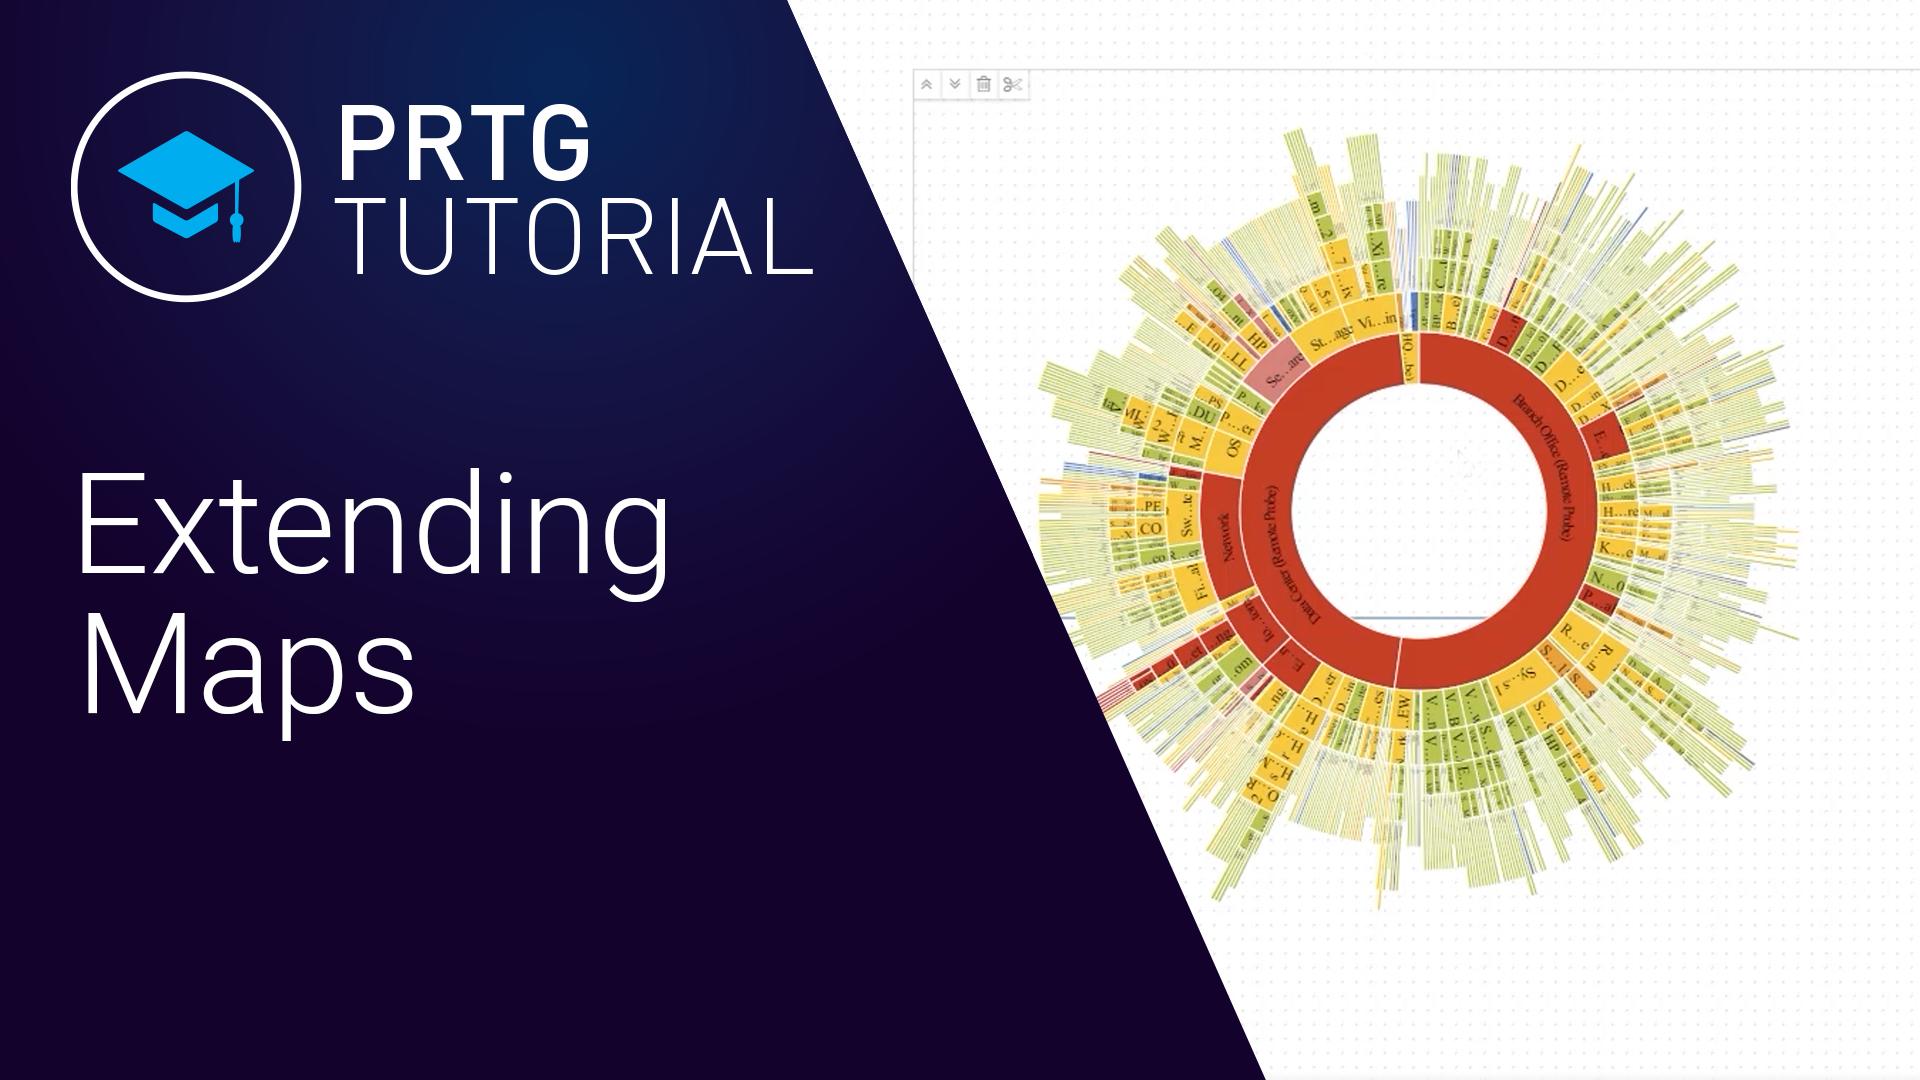 PRTG - Extending Maps (Videos, Maps)